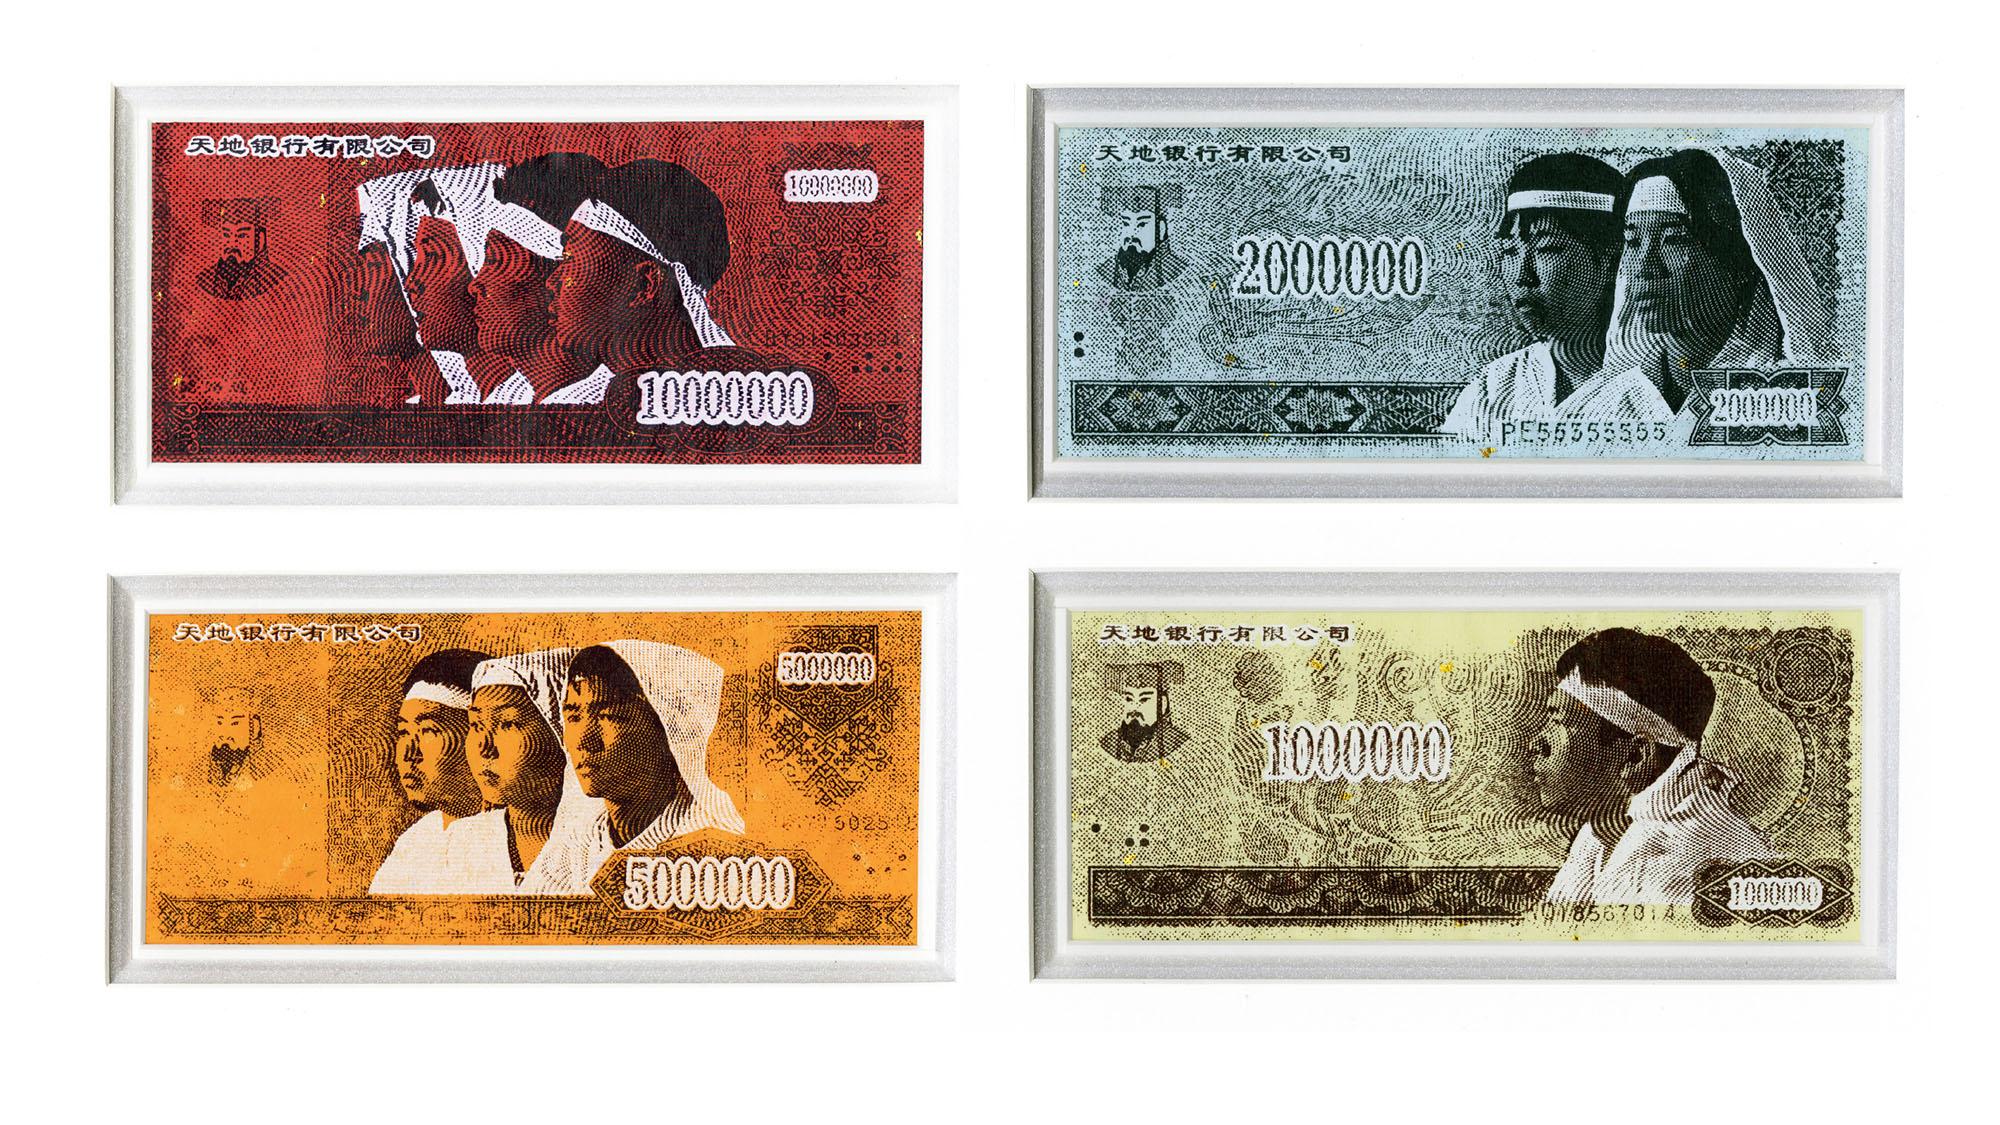 Hailing Liu - Exquisite Misery (Ver. Paper money Print)